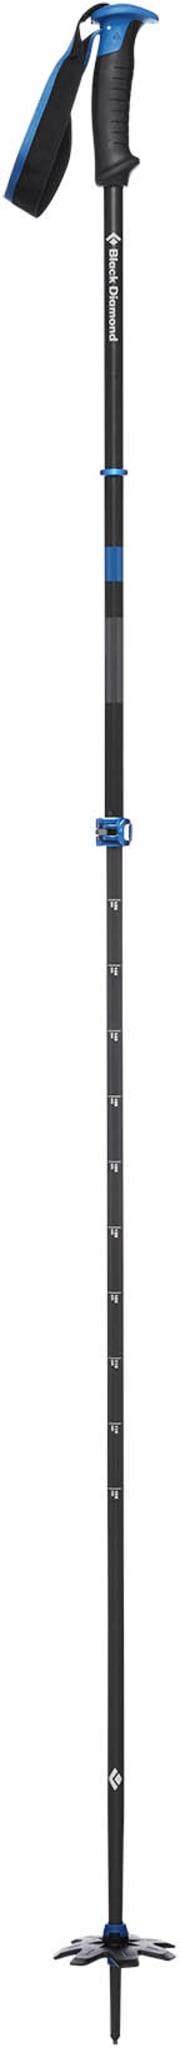 Solid aluminiumsstav med mulighet for uløsning av stroppene